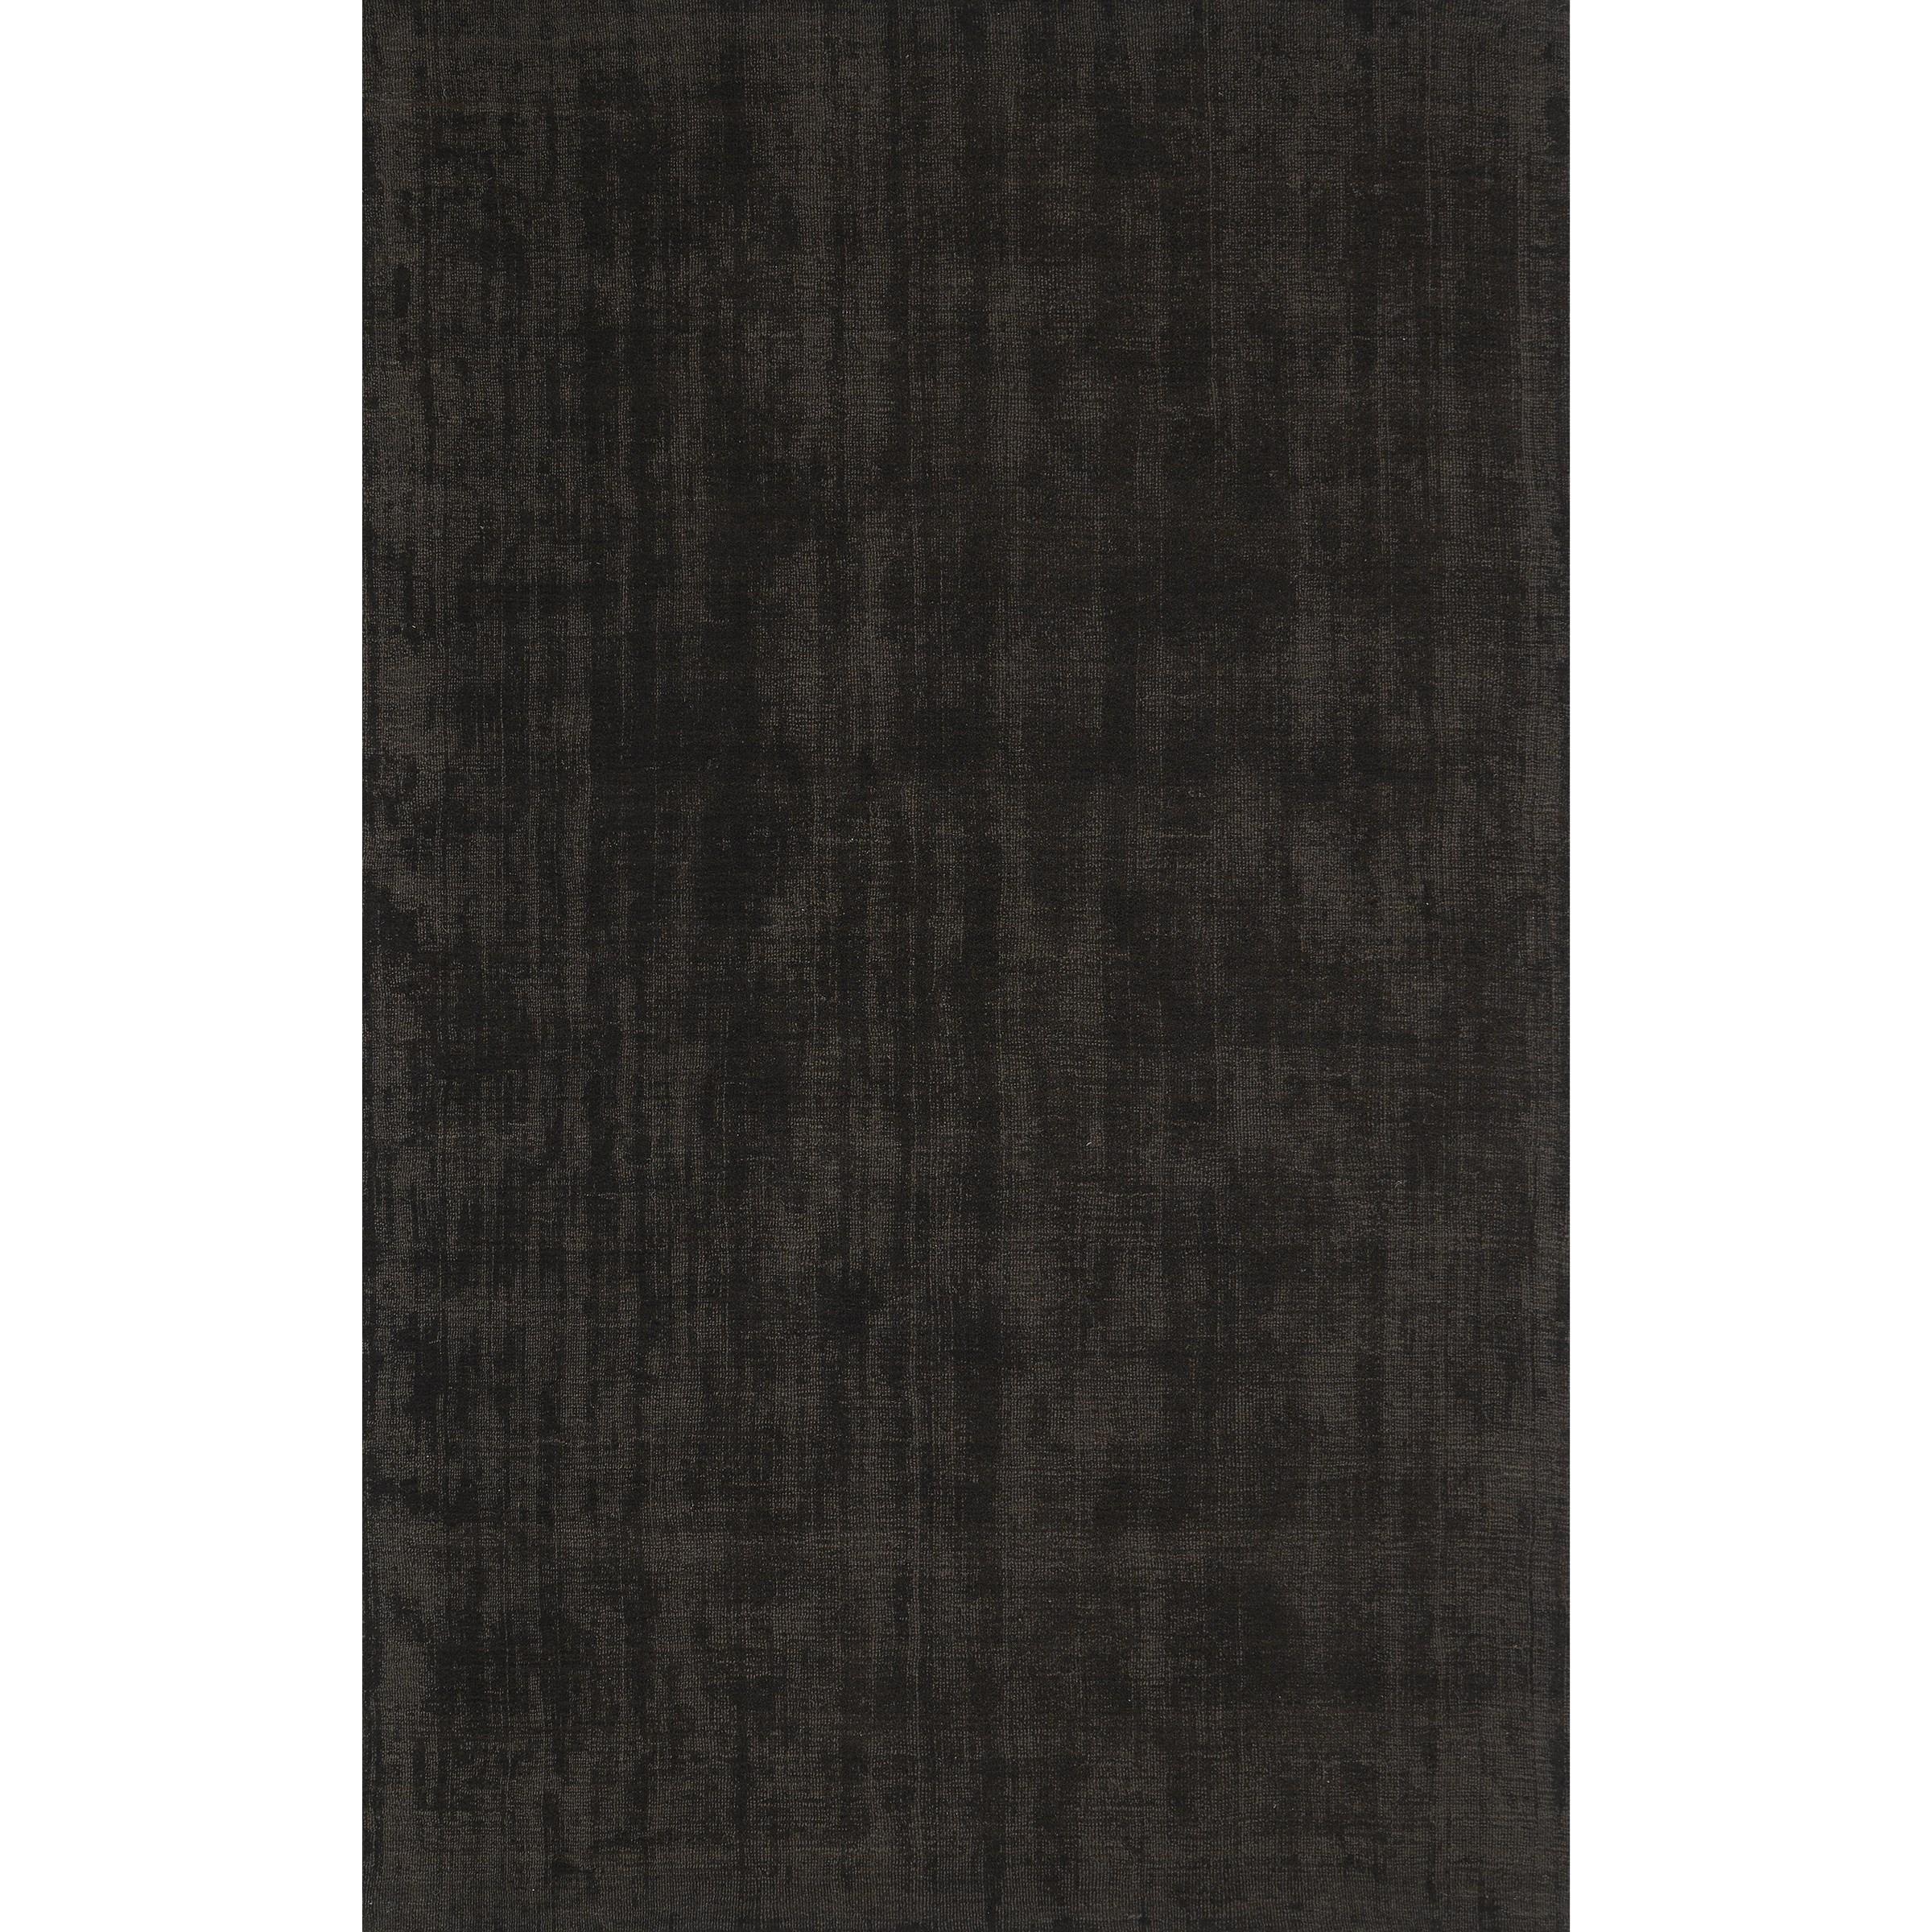 "Laramie Fudge 3'6""X5'6"" Rug by Dalyn at Fashion Furniture"